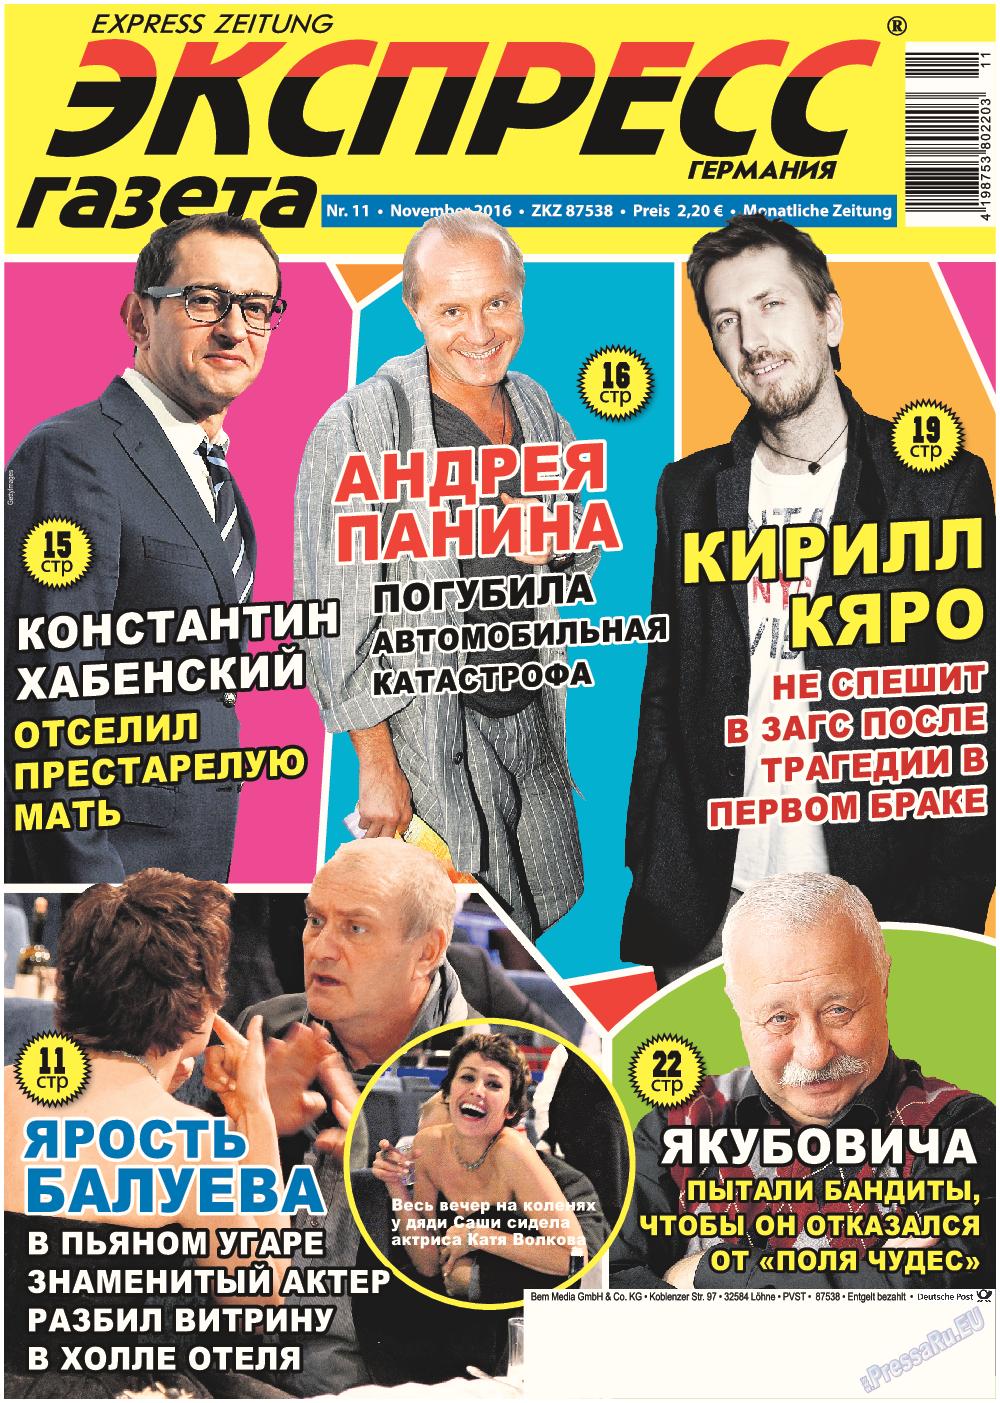 Экспресс газета (газета). 2016 год, номер 11, стр. 1